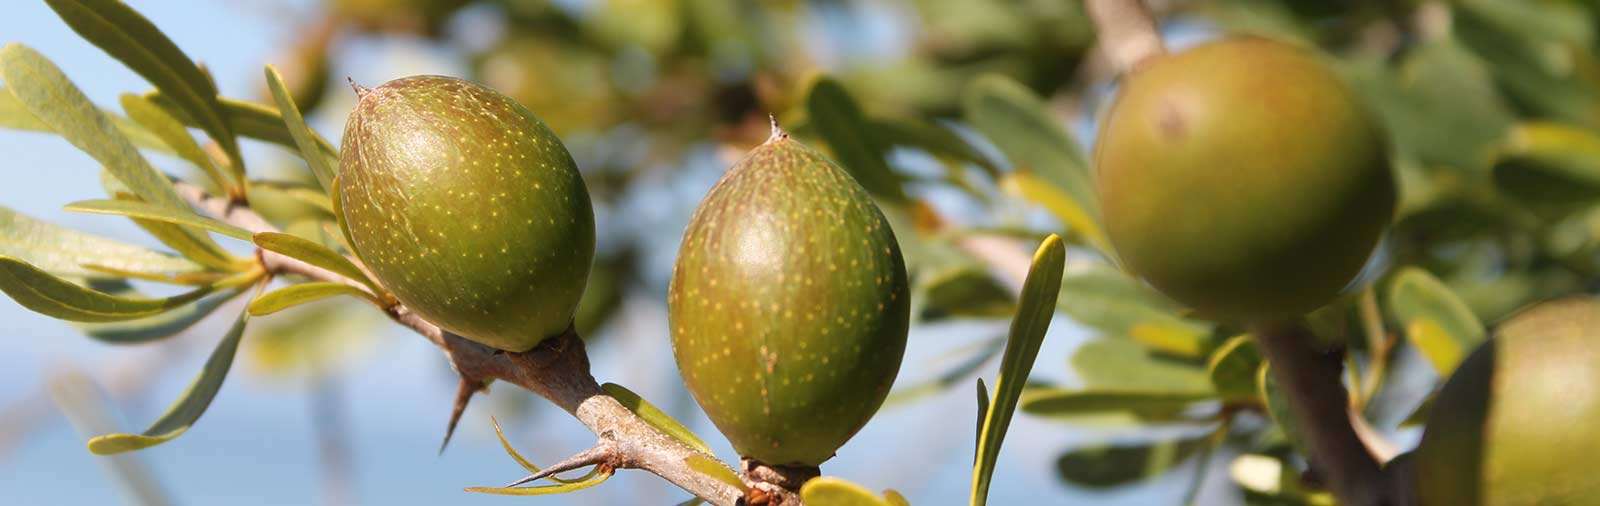 Arganbaum - Argania spinosa